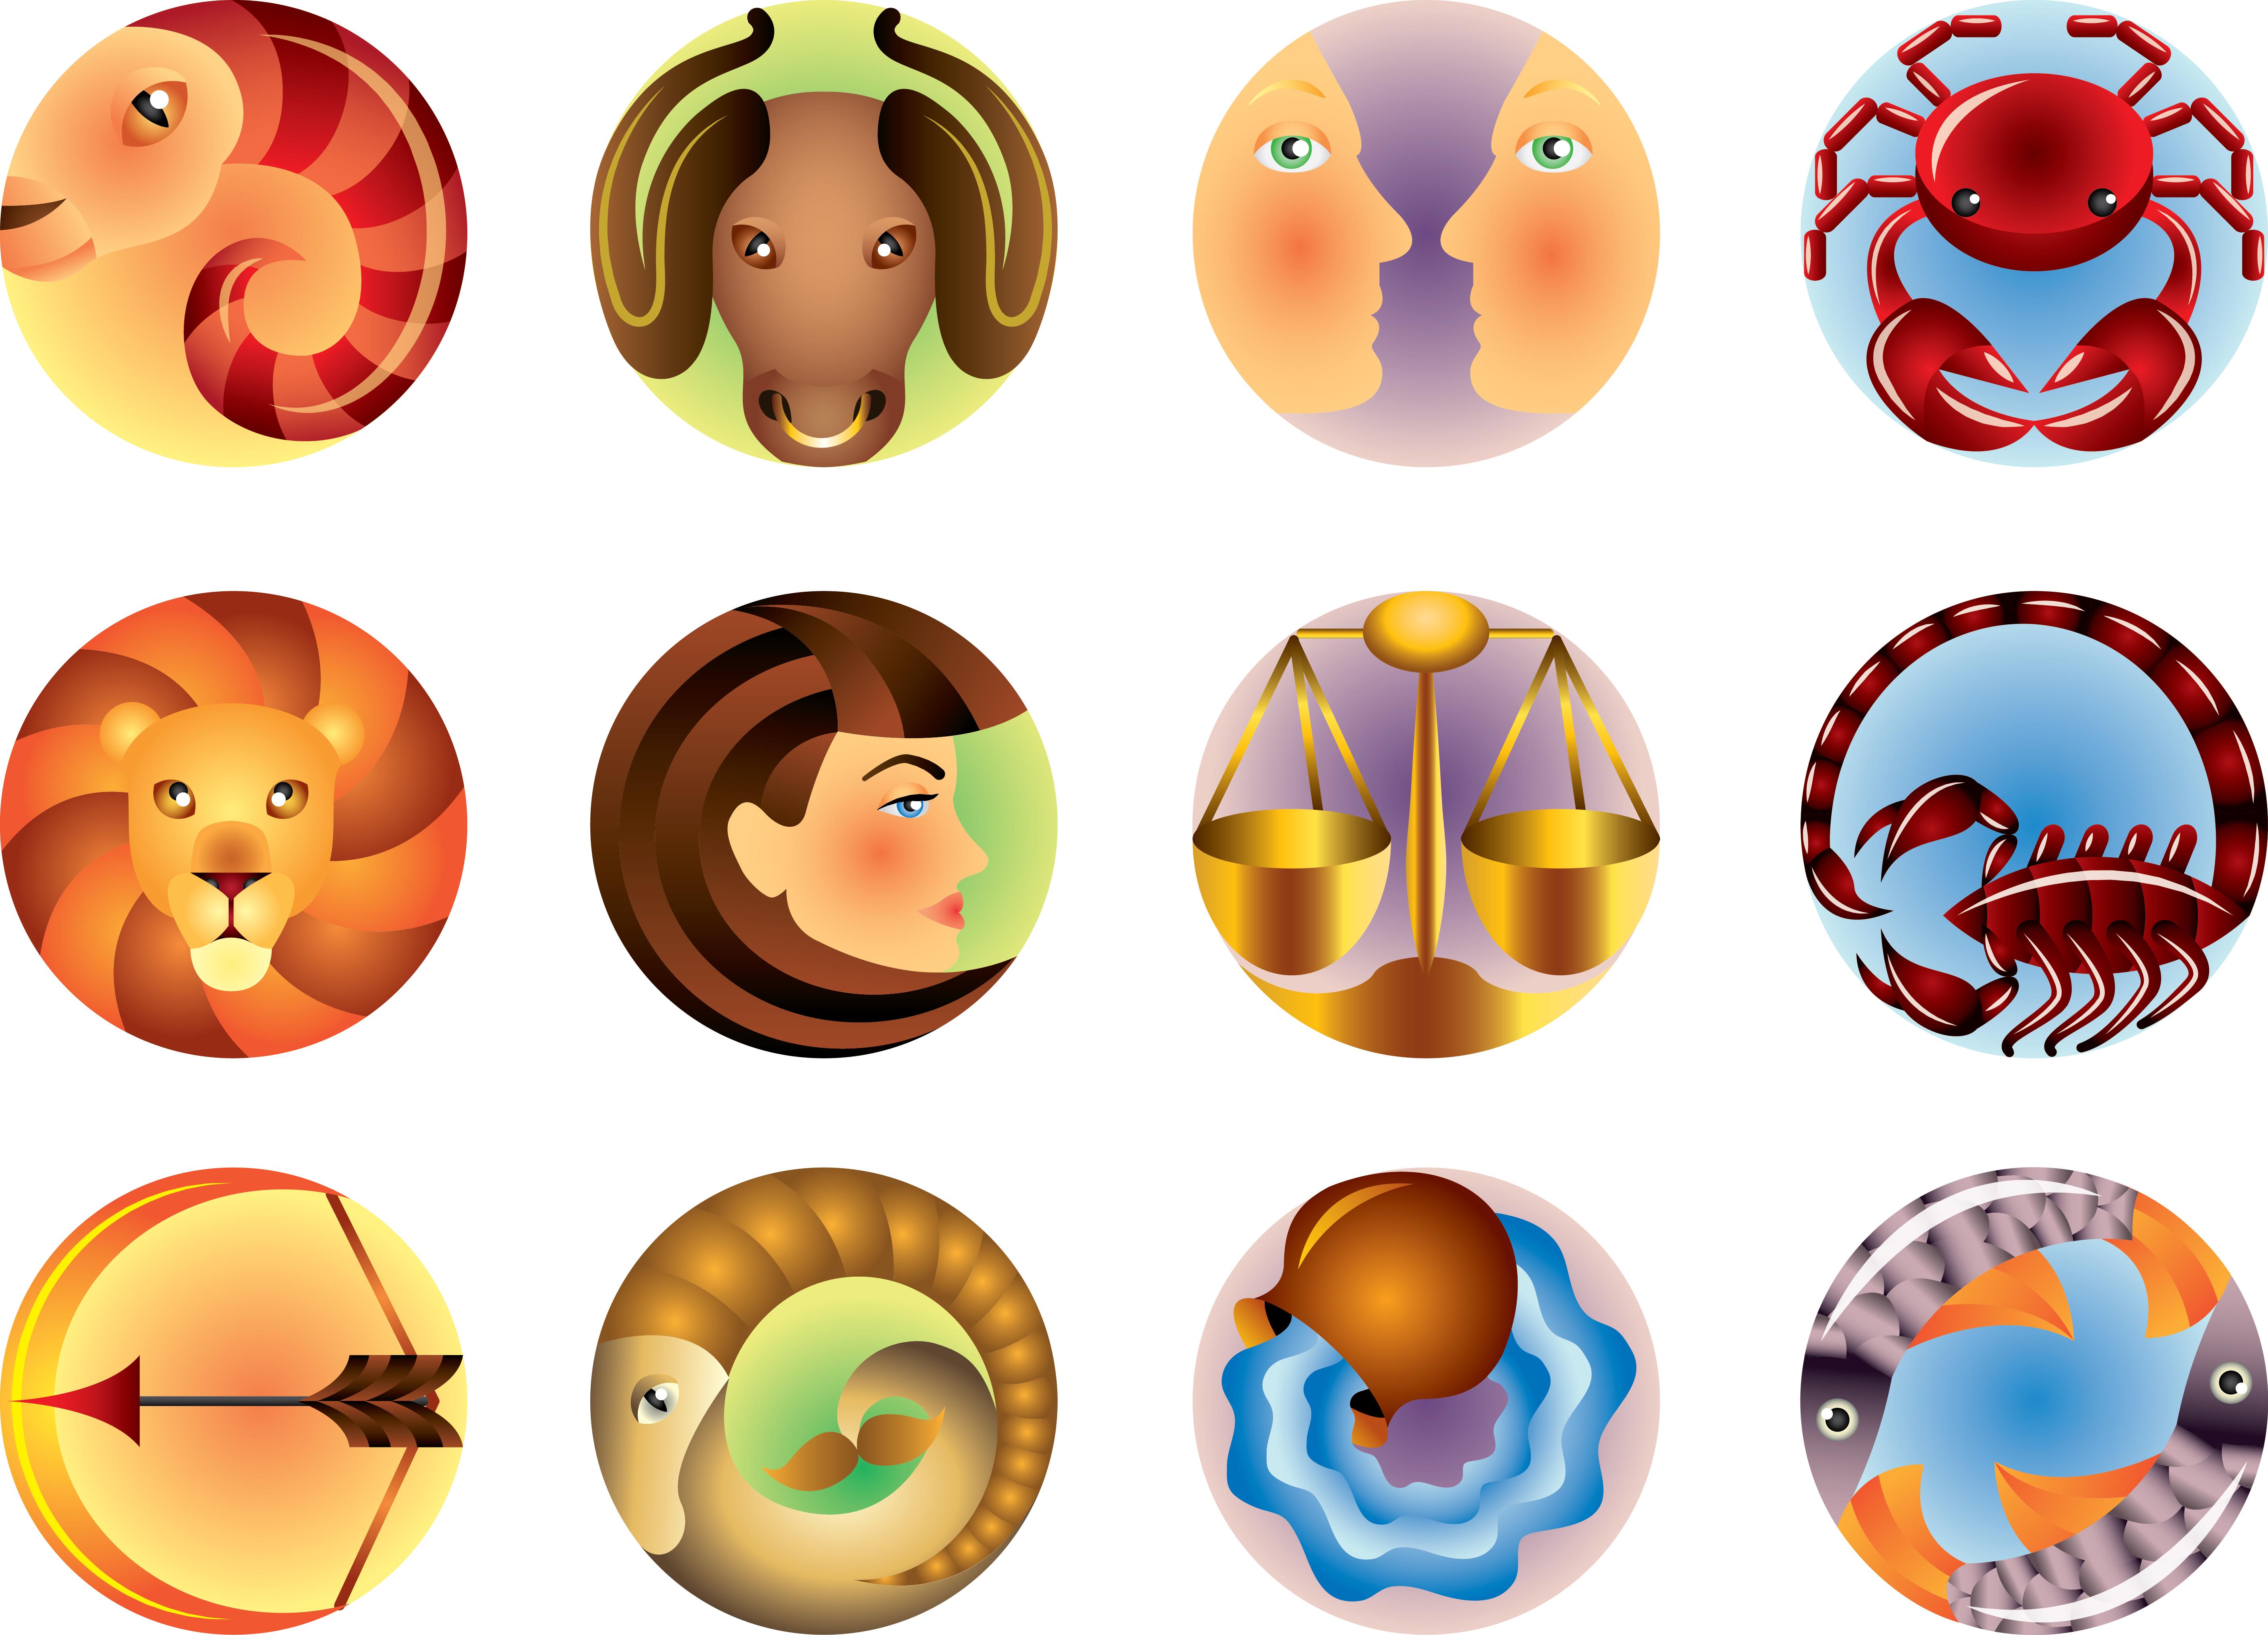 Horoscop zilnic, 23 noiembrie 2015. Taurii avanseaza in cariera, iar Berbecii au parte de o surpriza in viata sentimentala